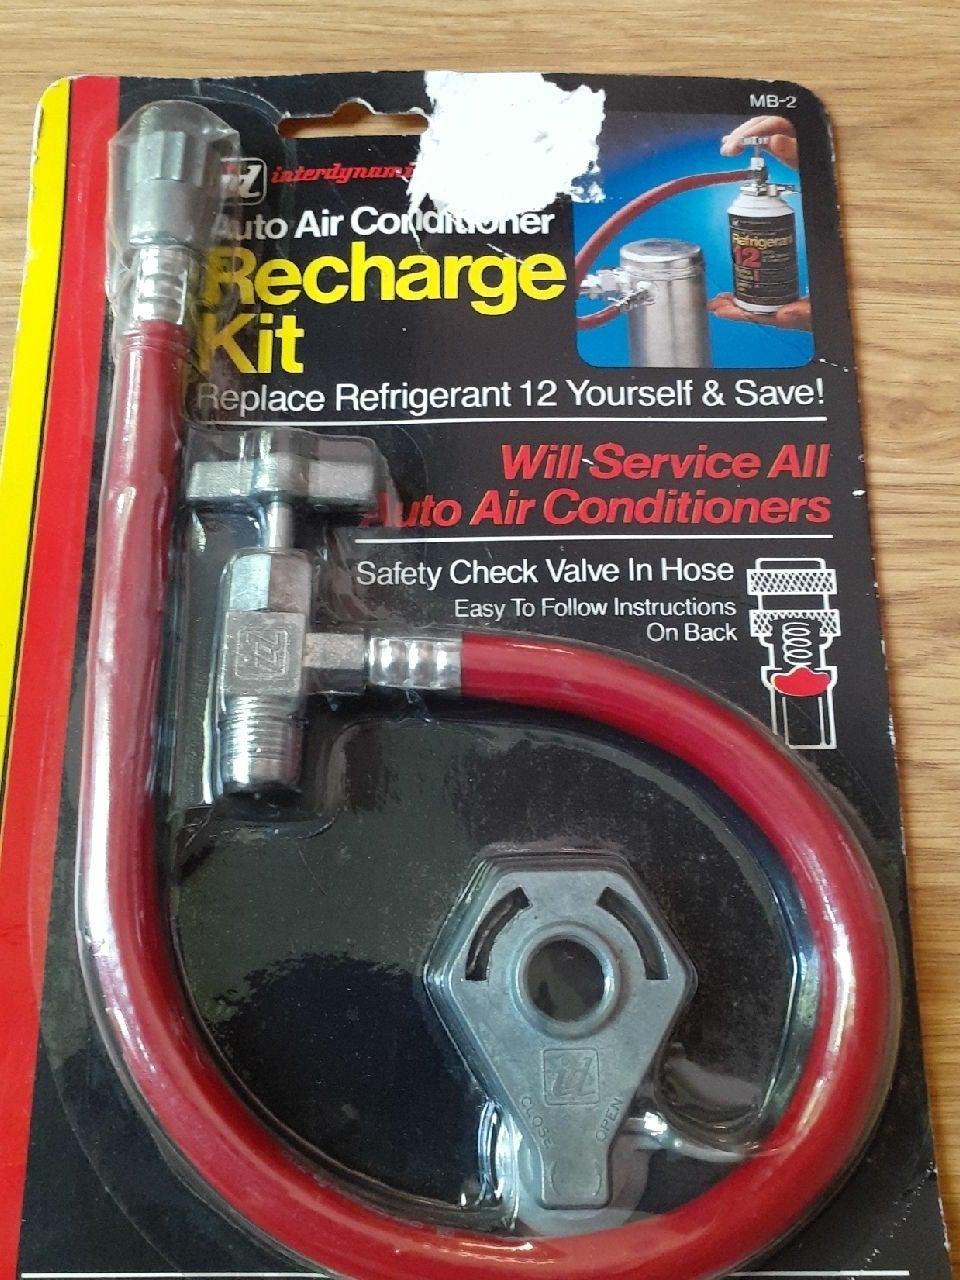 Interdynamics MB-2 Auto AC Recharge Kit